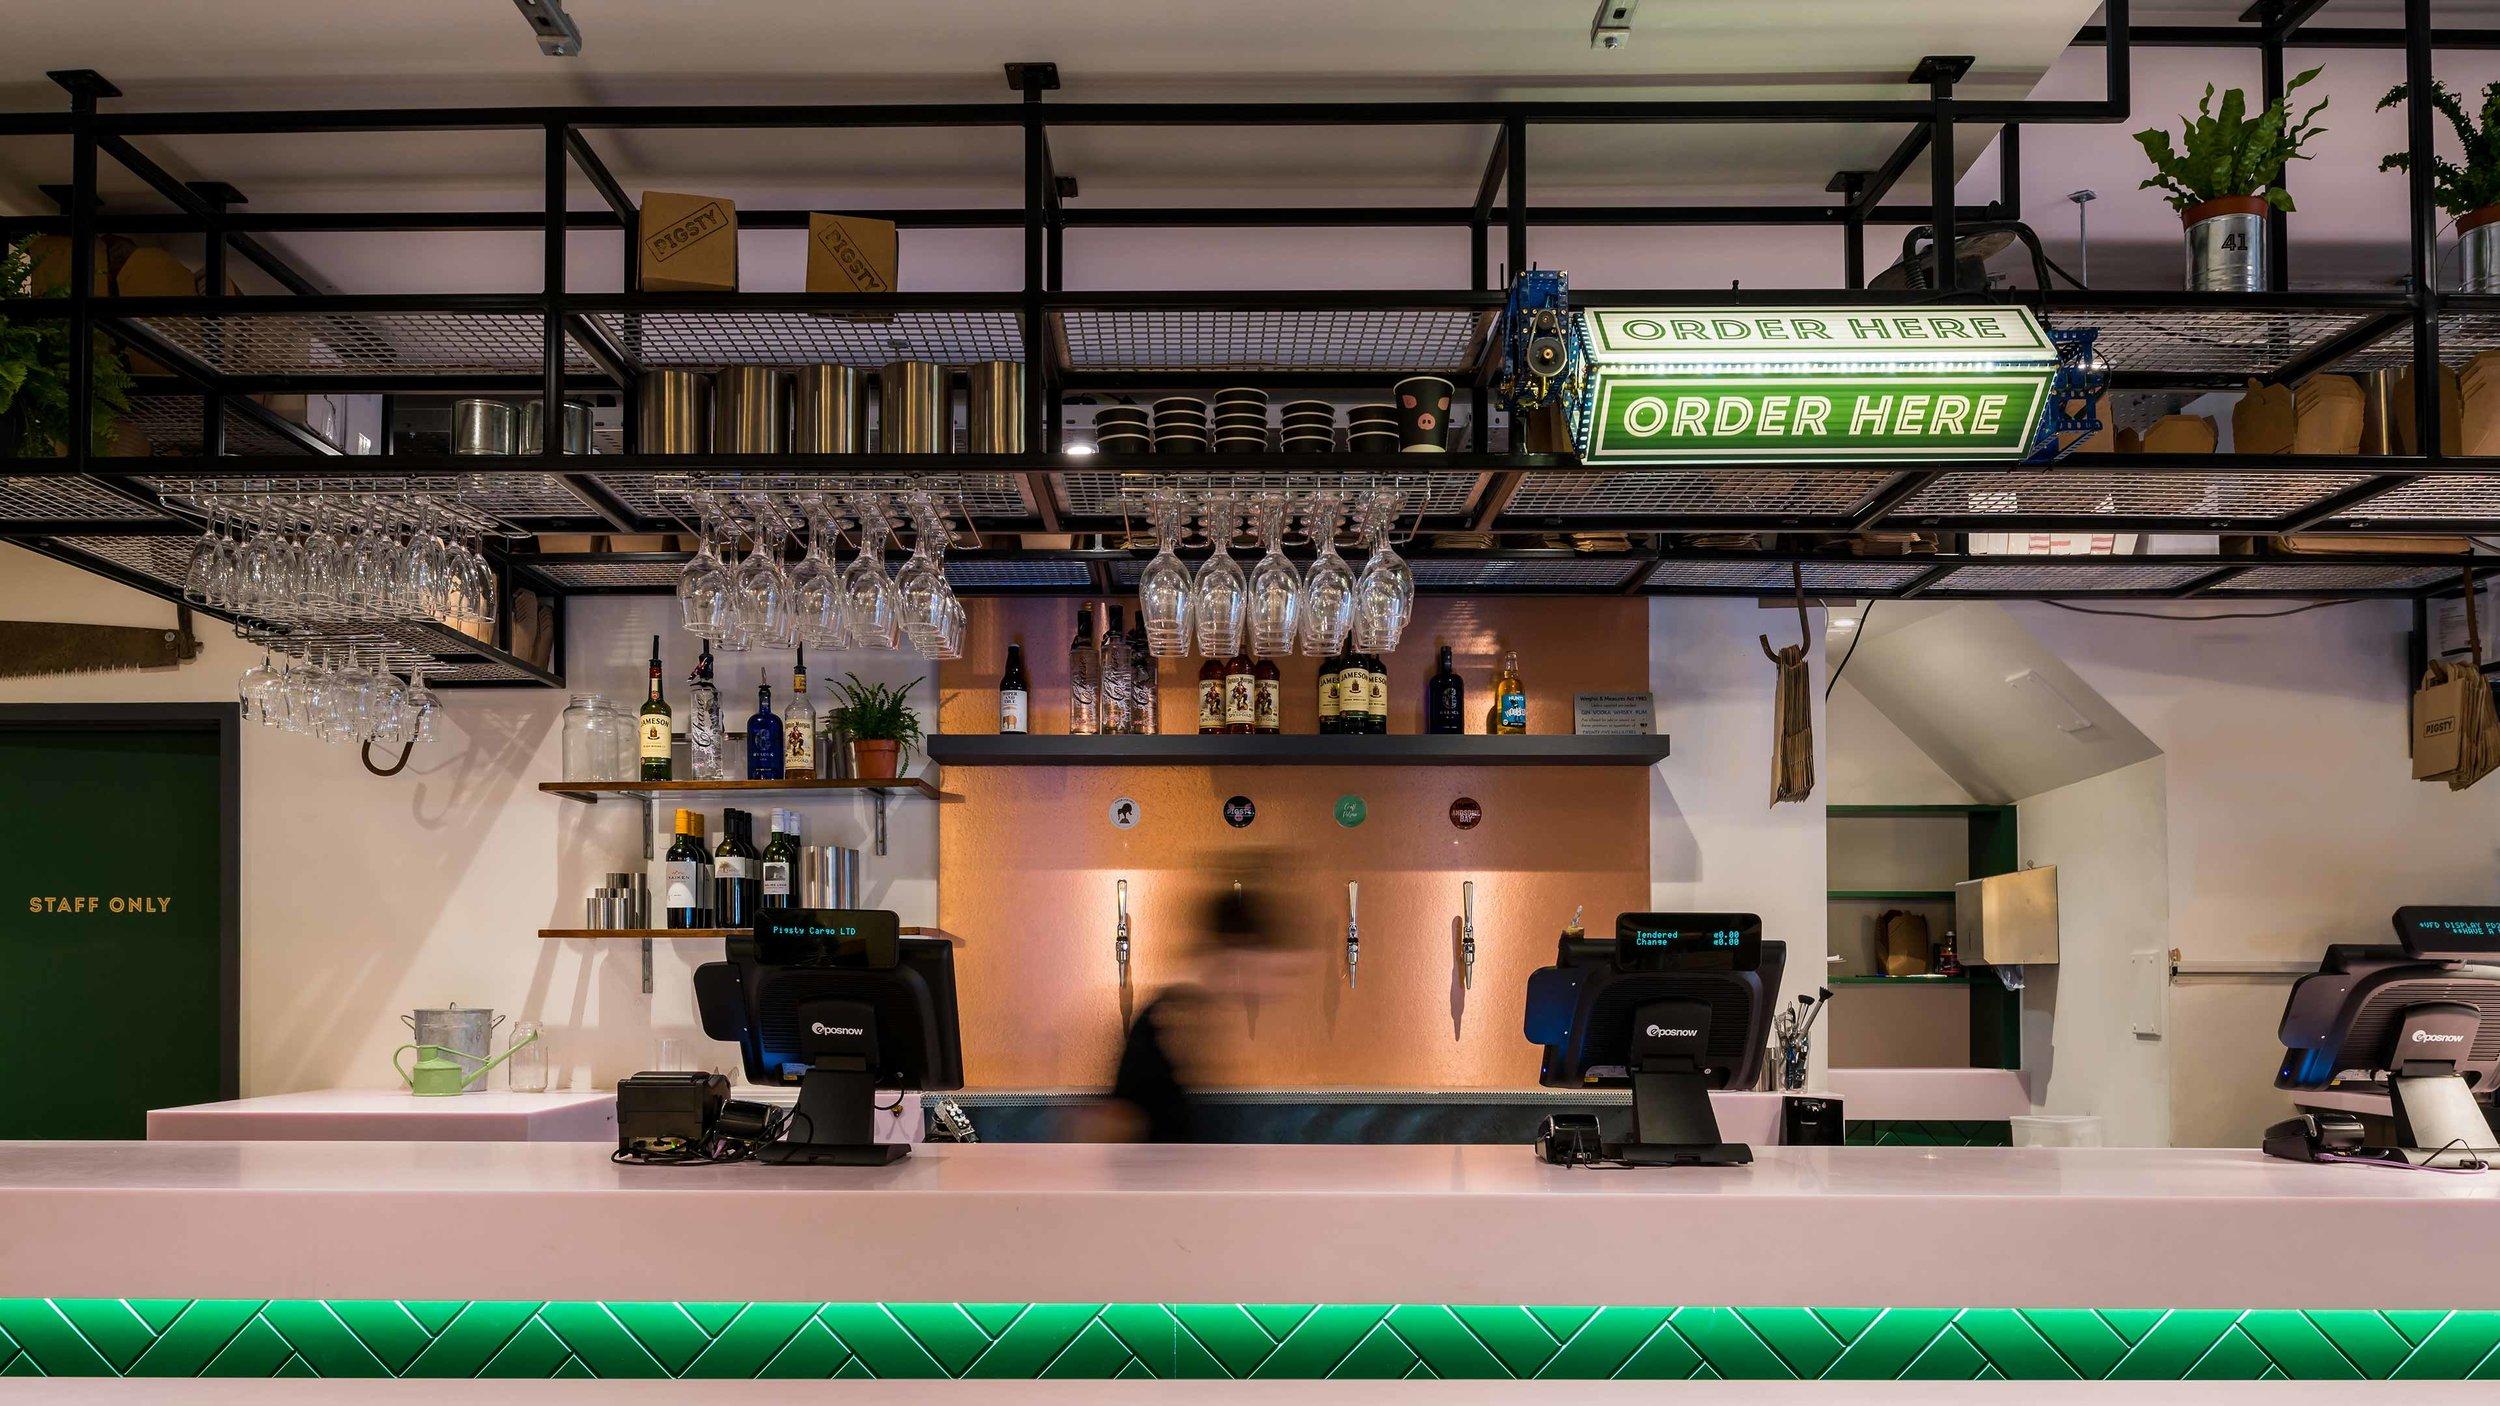 Pigsty Interior Bar Counter